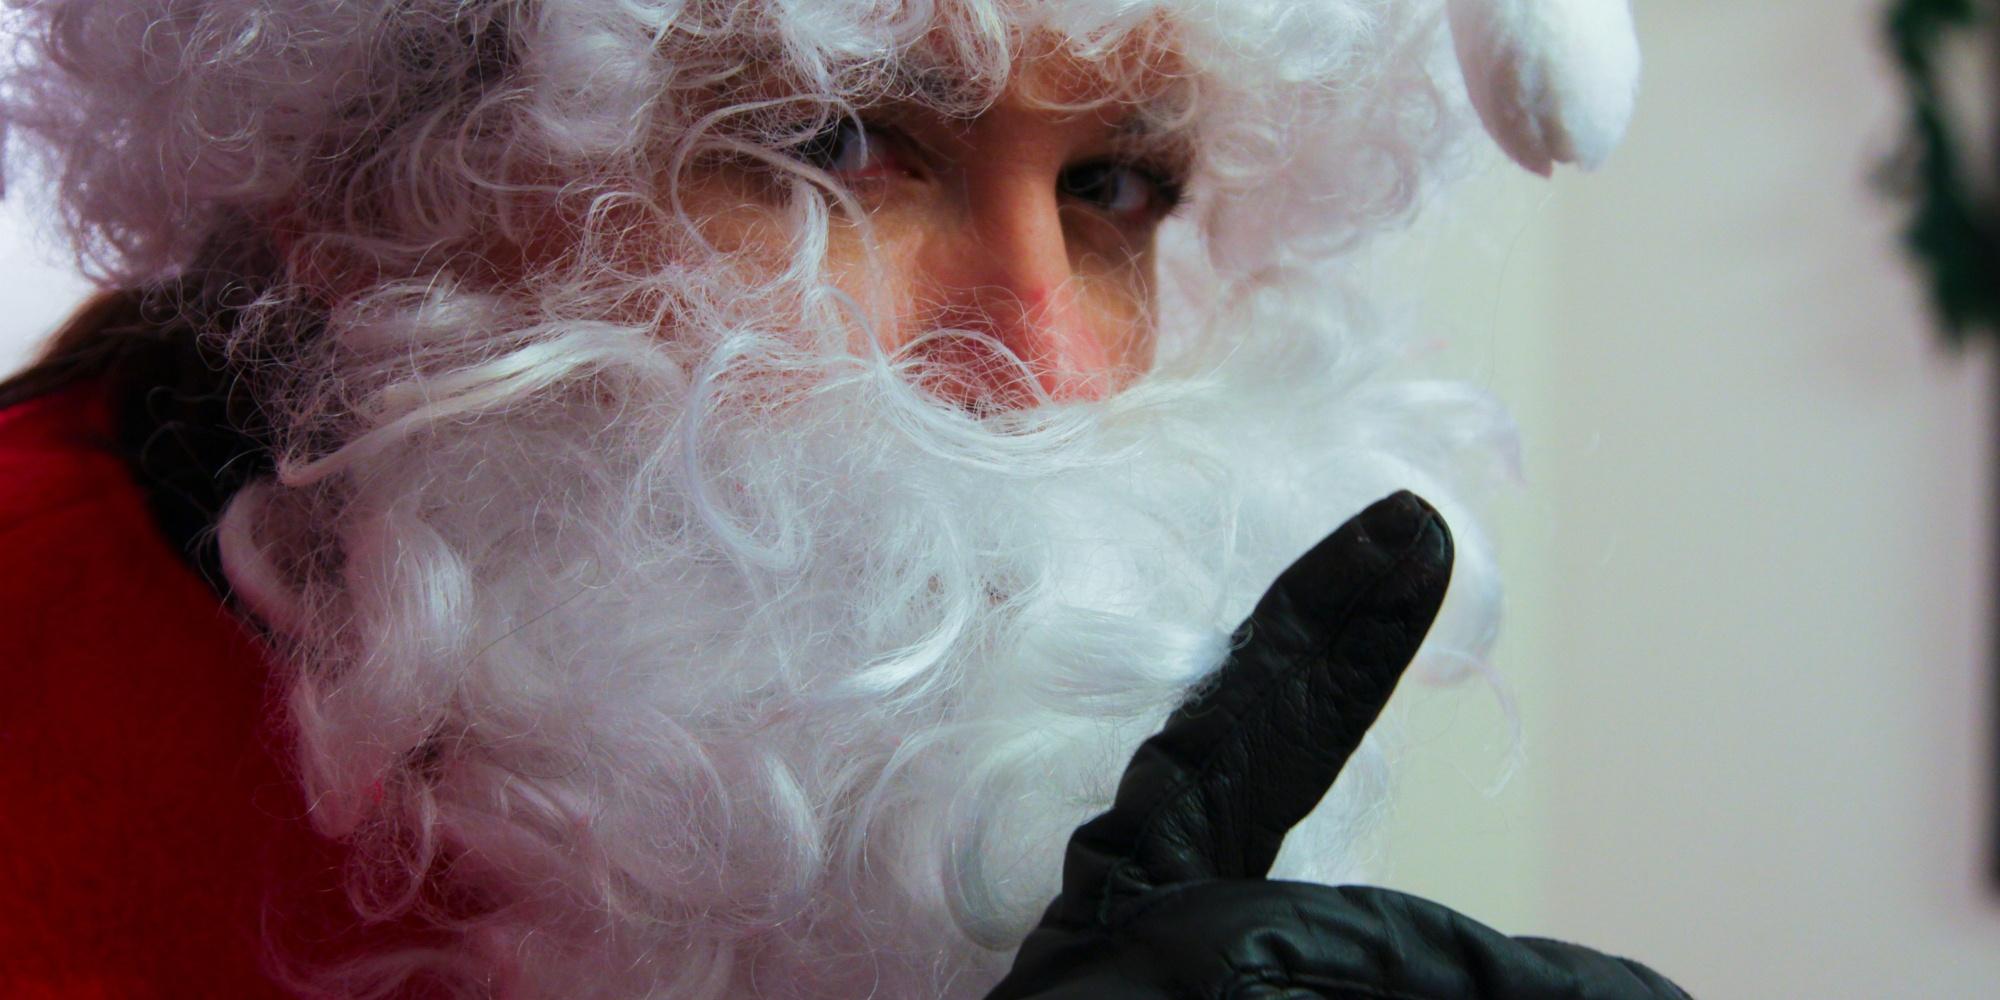 Merry Christmas - Short Film One In Ten Productions UK